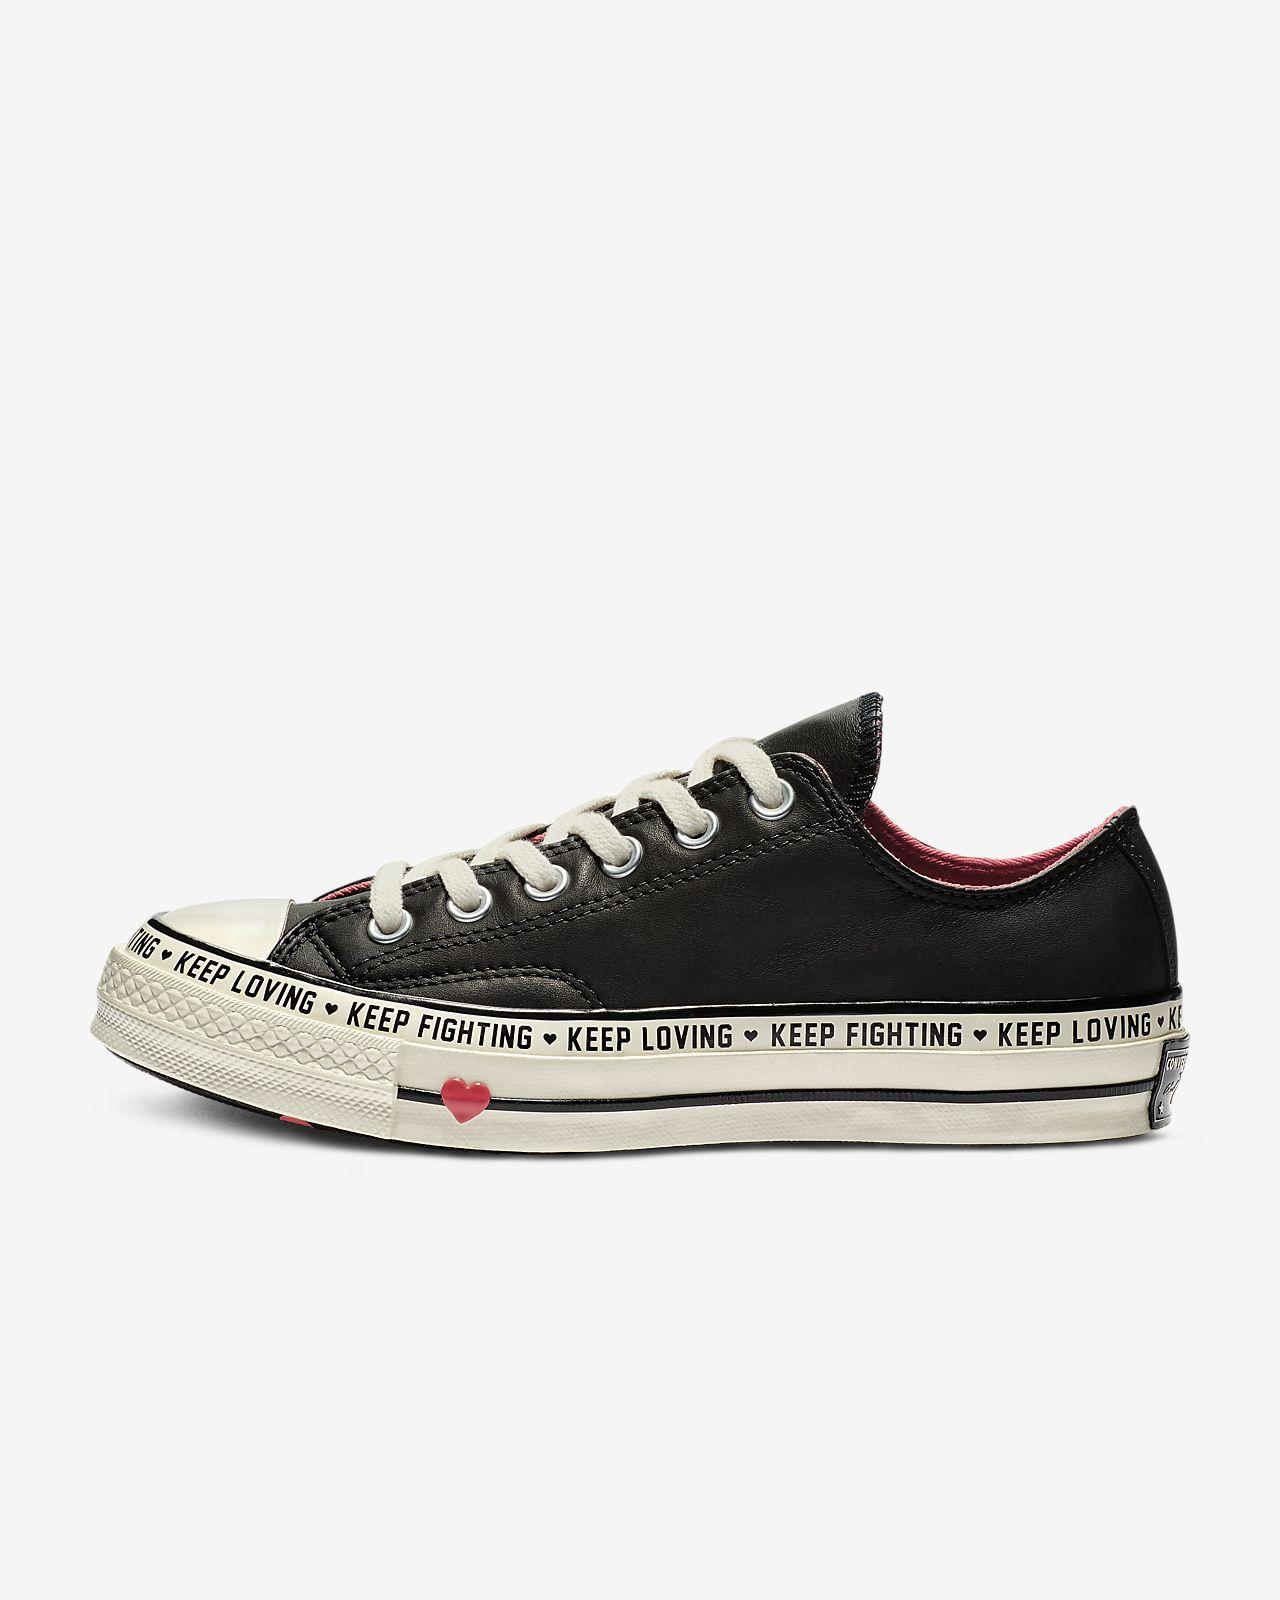 Converse Chuck 70 Love Graphic Low Top Women's Shoe